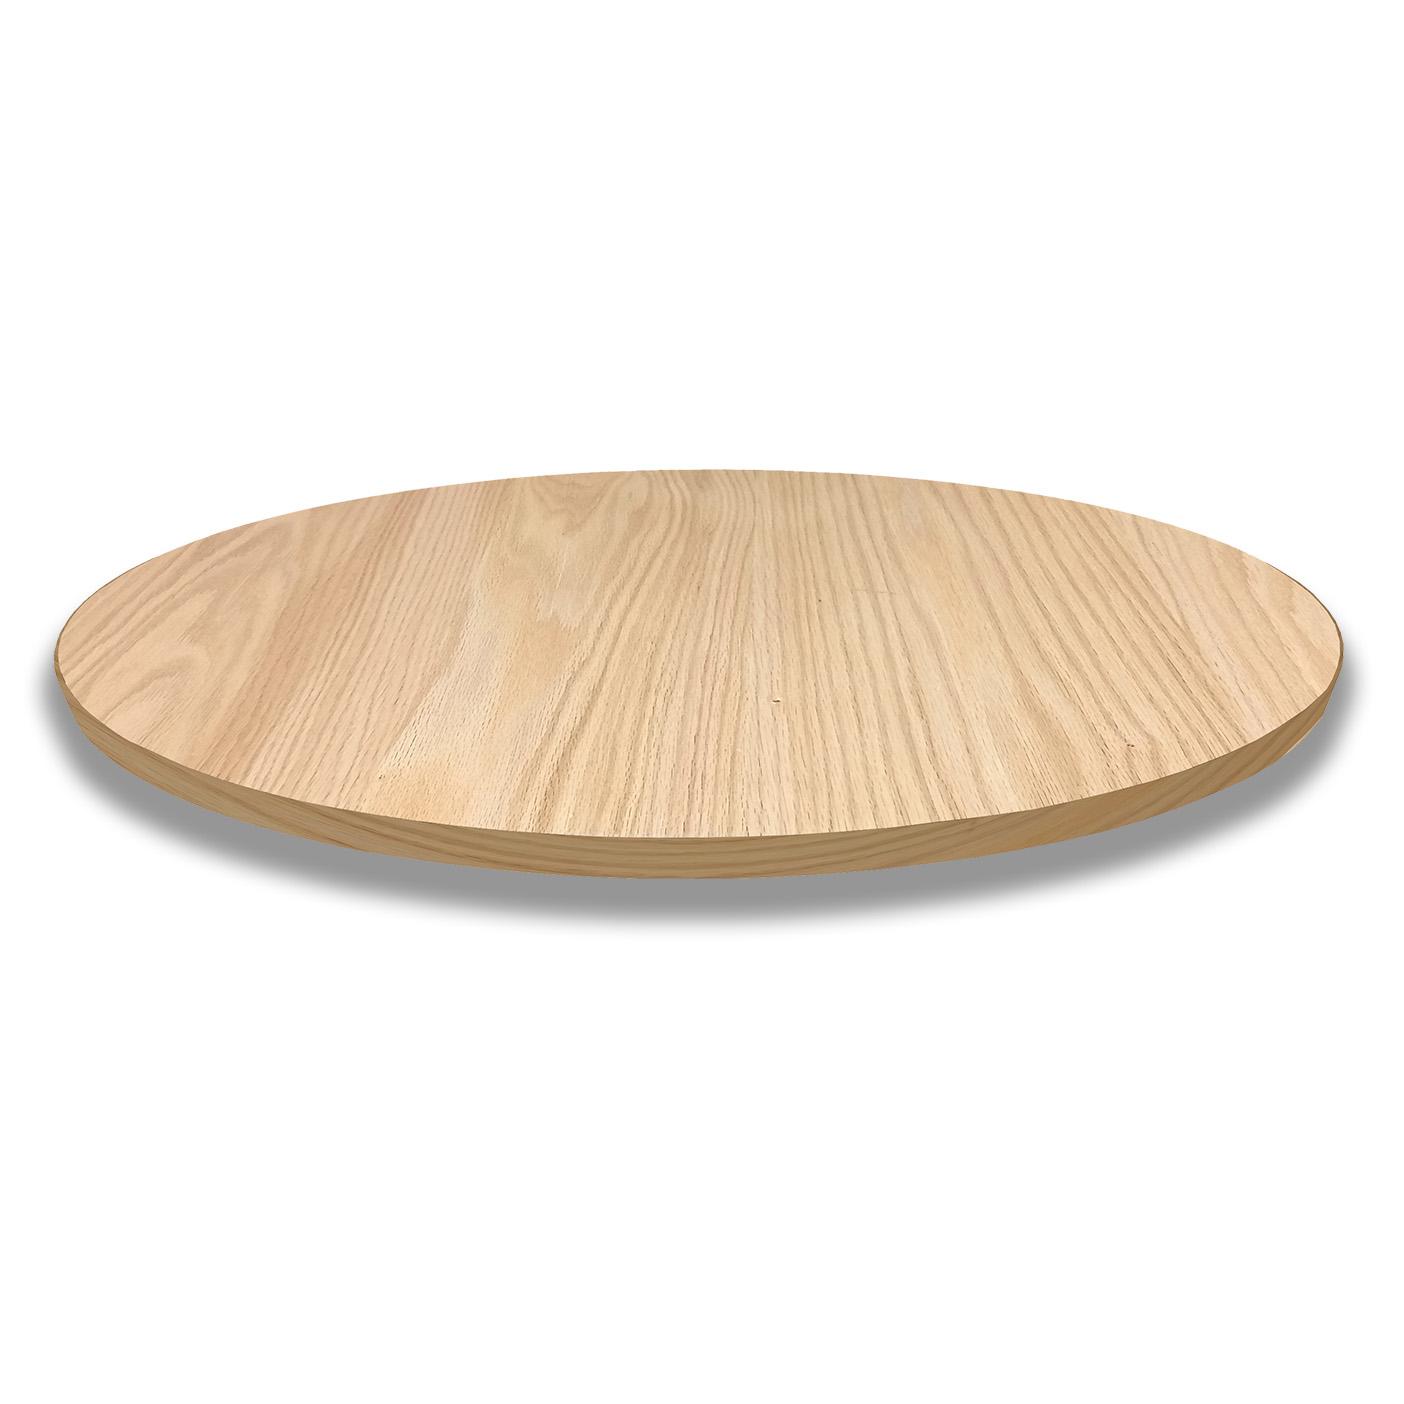 Oak Street WDL36R-CC table top, wood